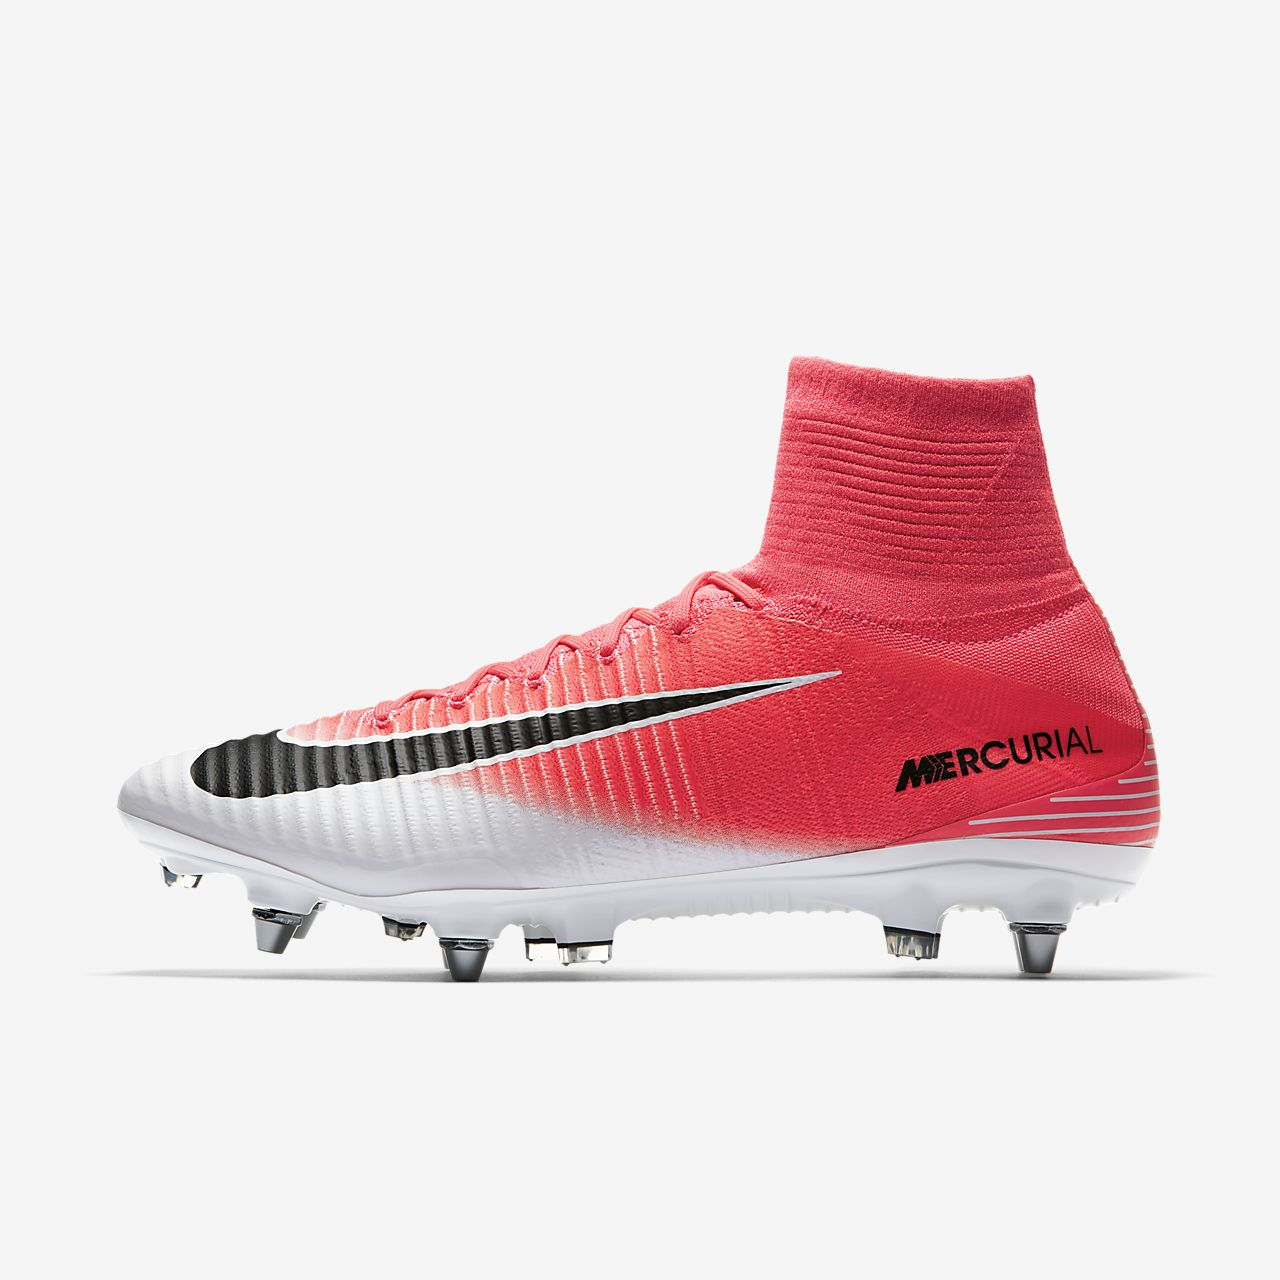 Chaussure de football à crampons pour terrain gras Nike Mercurial Superfly V Dynamic Fit SG PRO